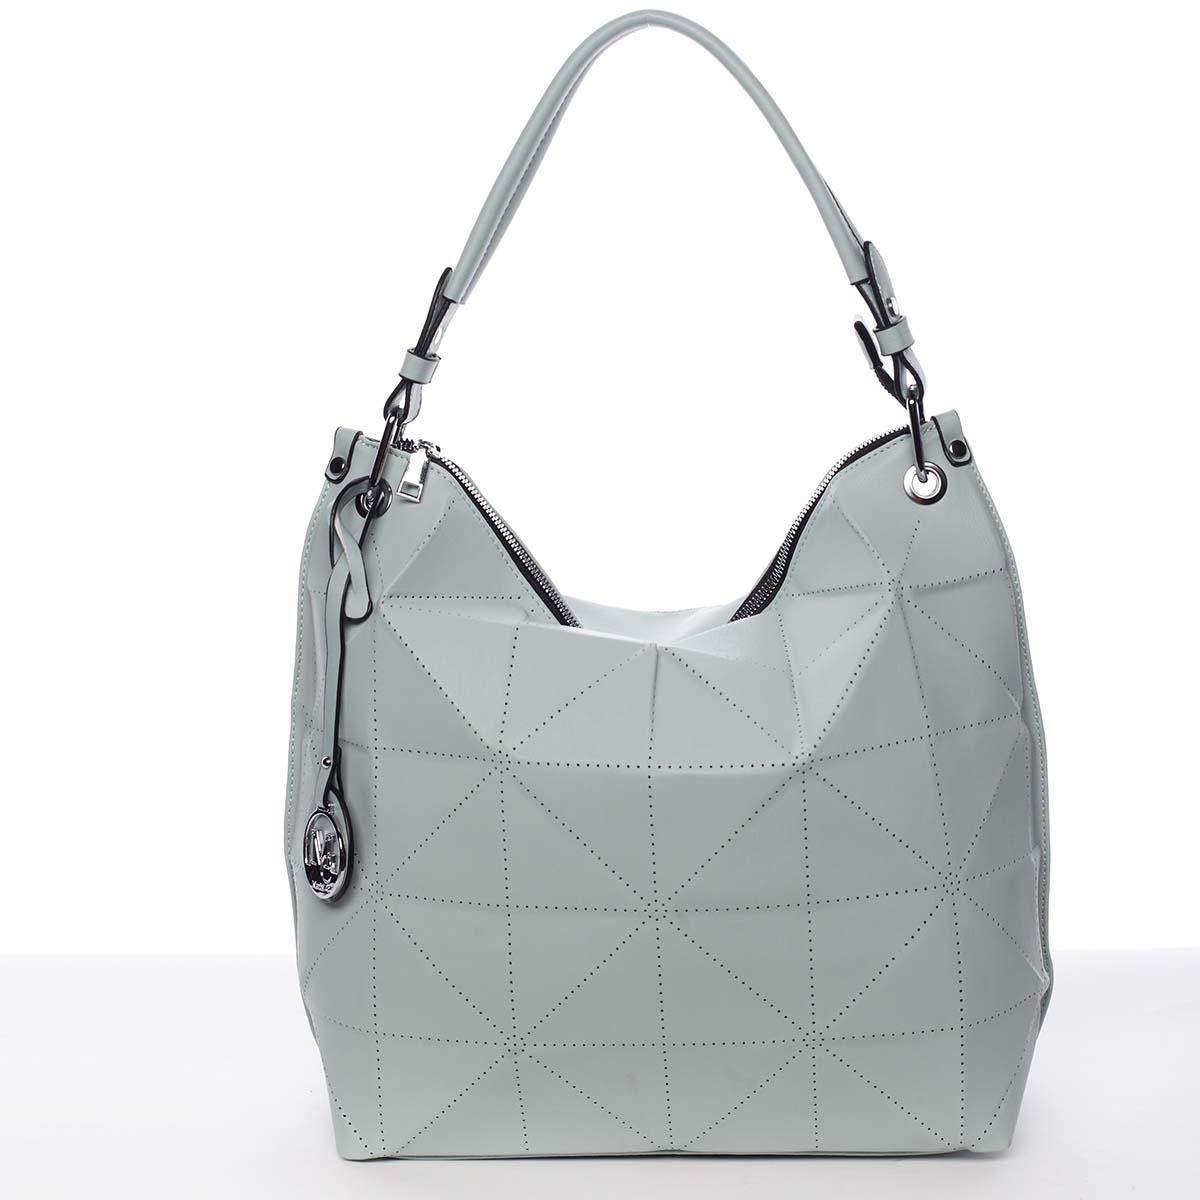 Veľká mentolovozelená luxusná dámska kabelka cez plece - MARIA C Samira